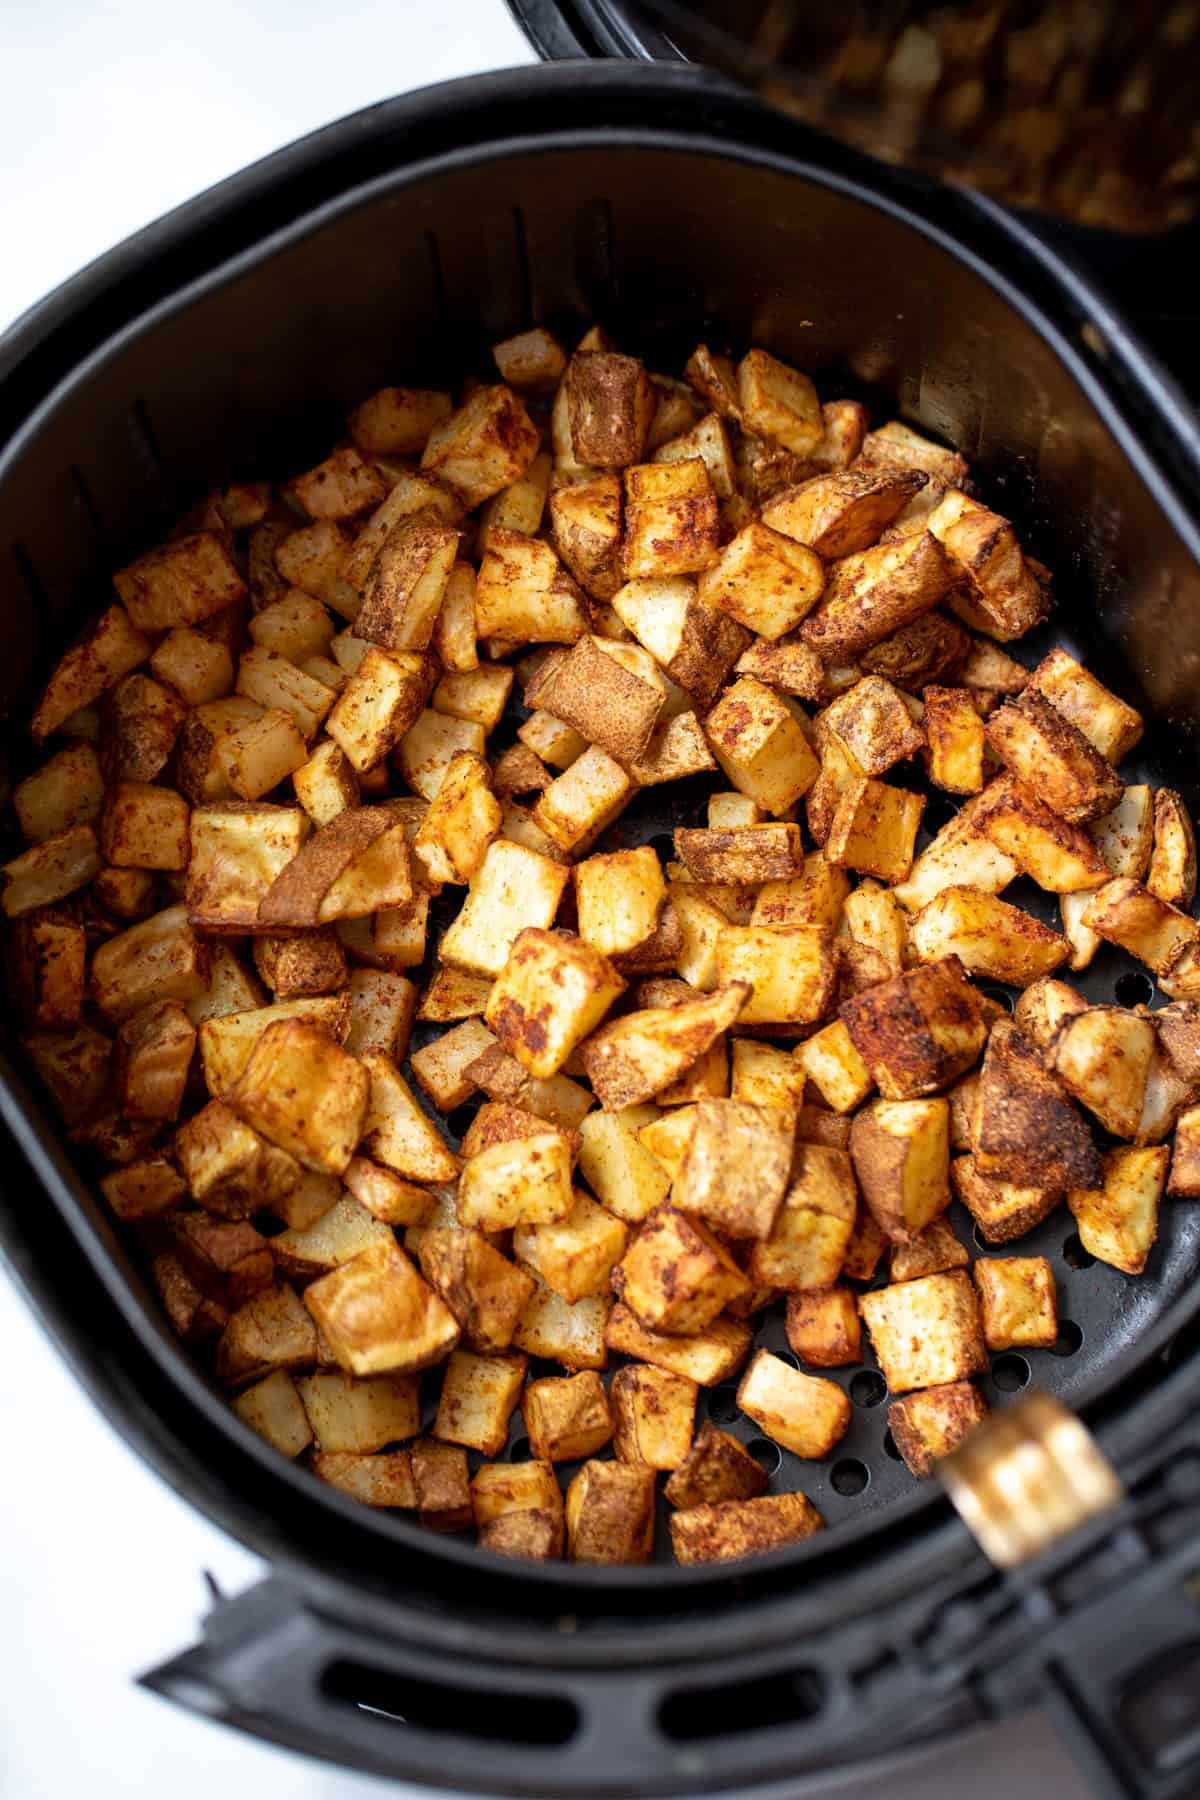 Air Fryer Basket with cubed seasoned potatoes.